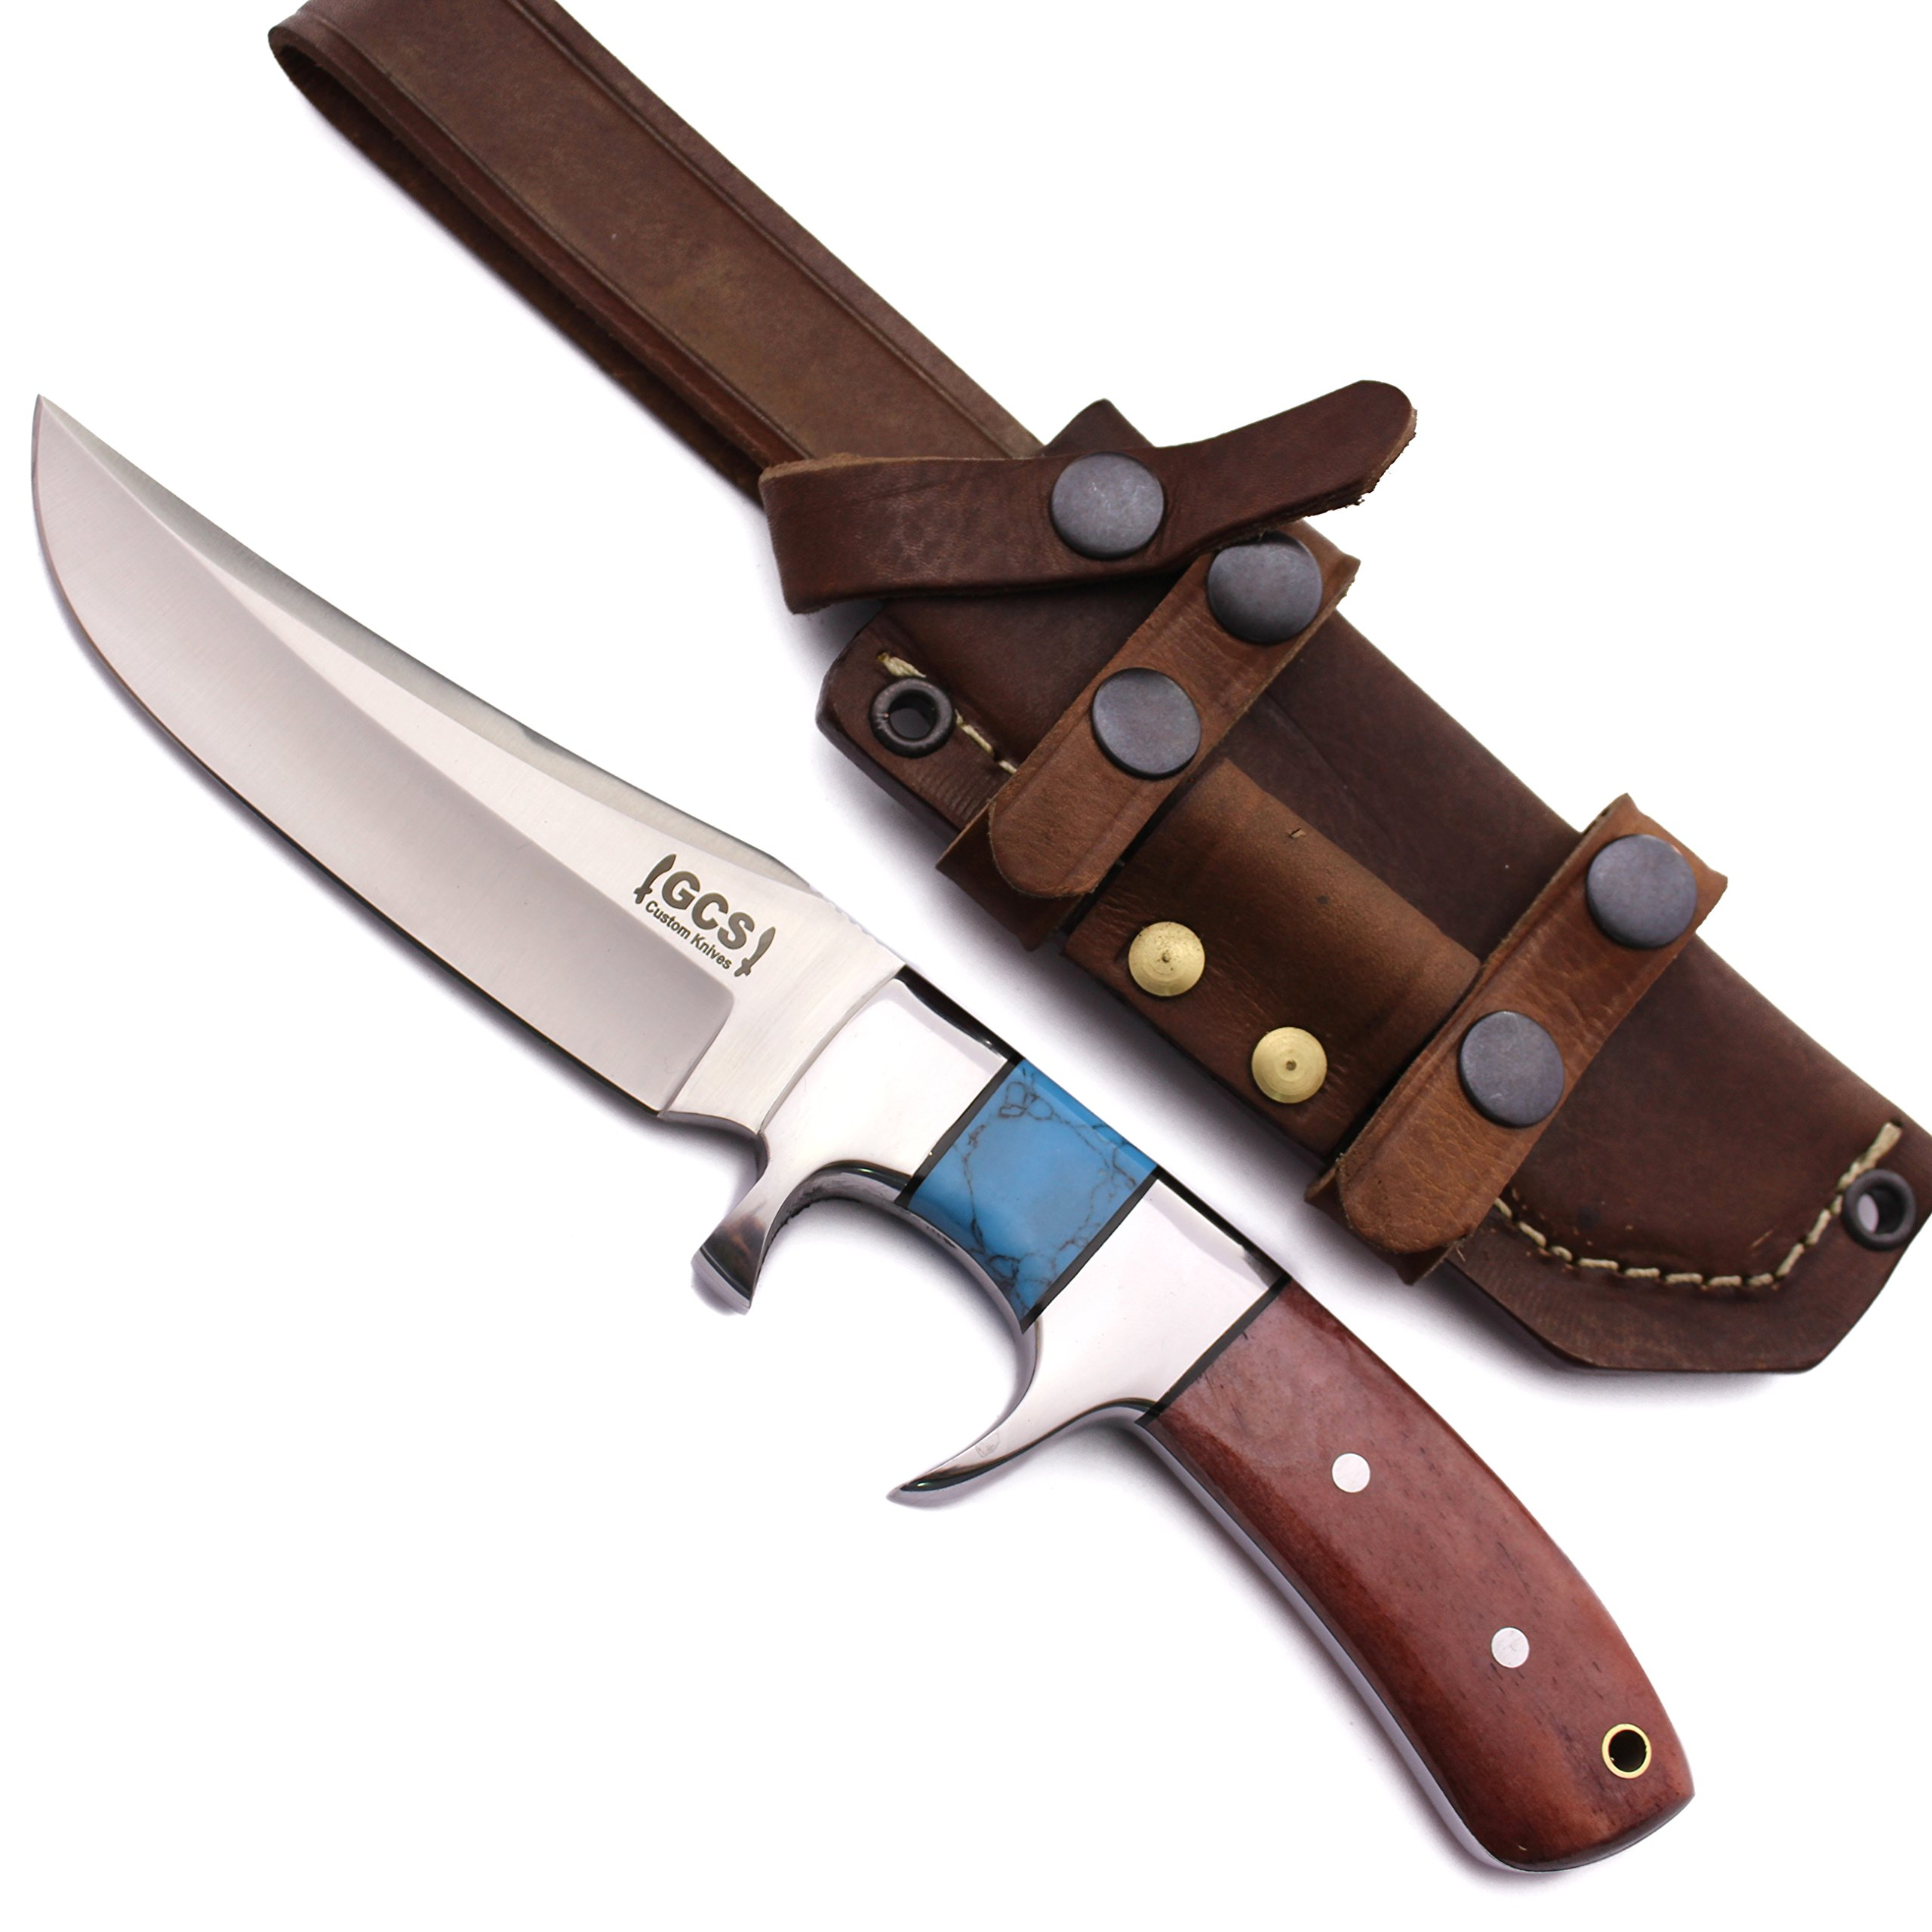 GCS Custom Handmade Coloured Bone & Turquoise Handle D2 Tool Steel Knife & Buffalo Hide Sheath 186